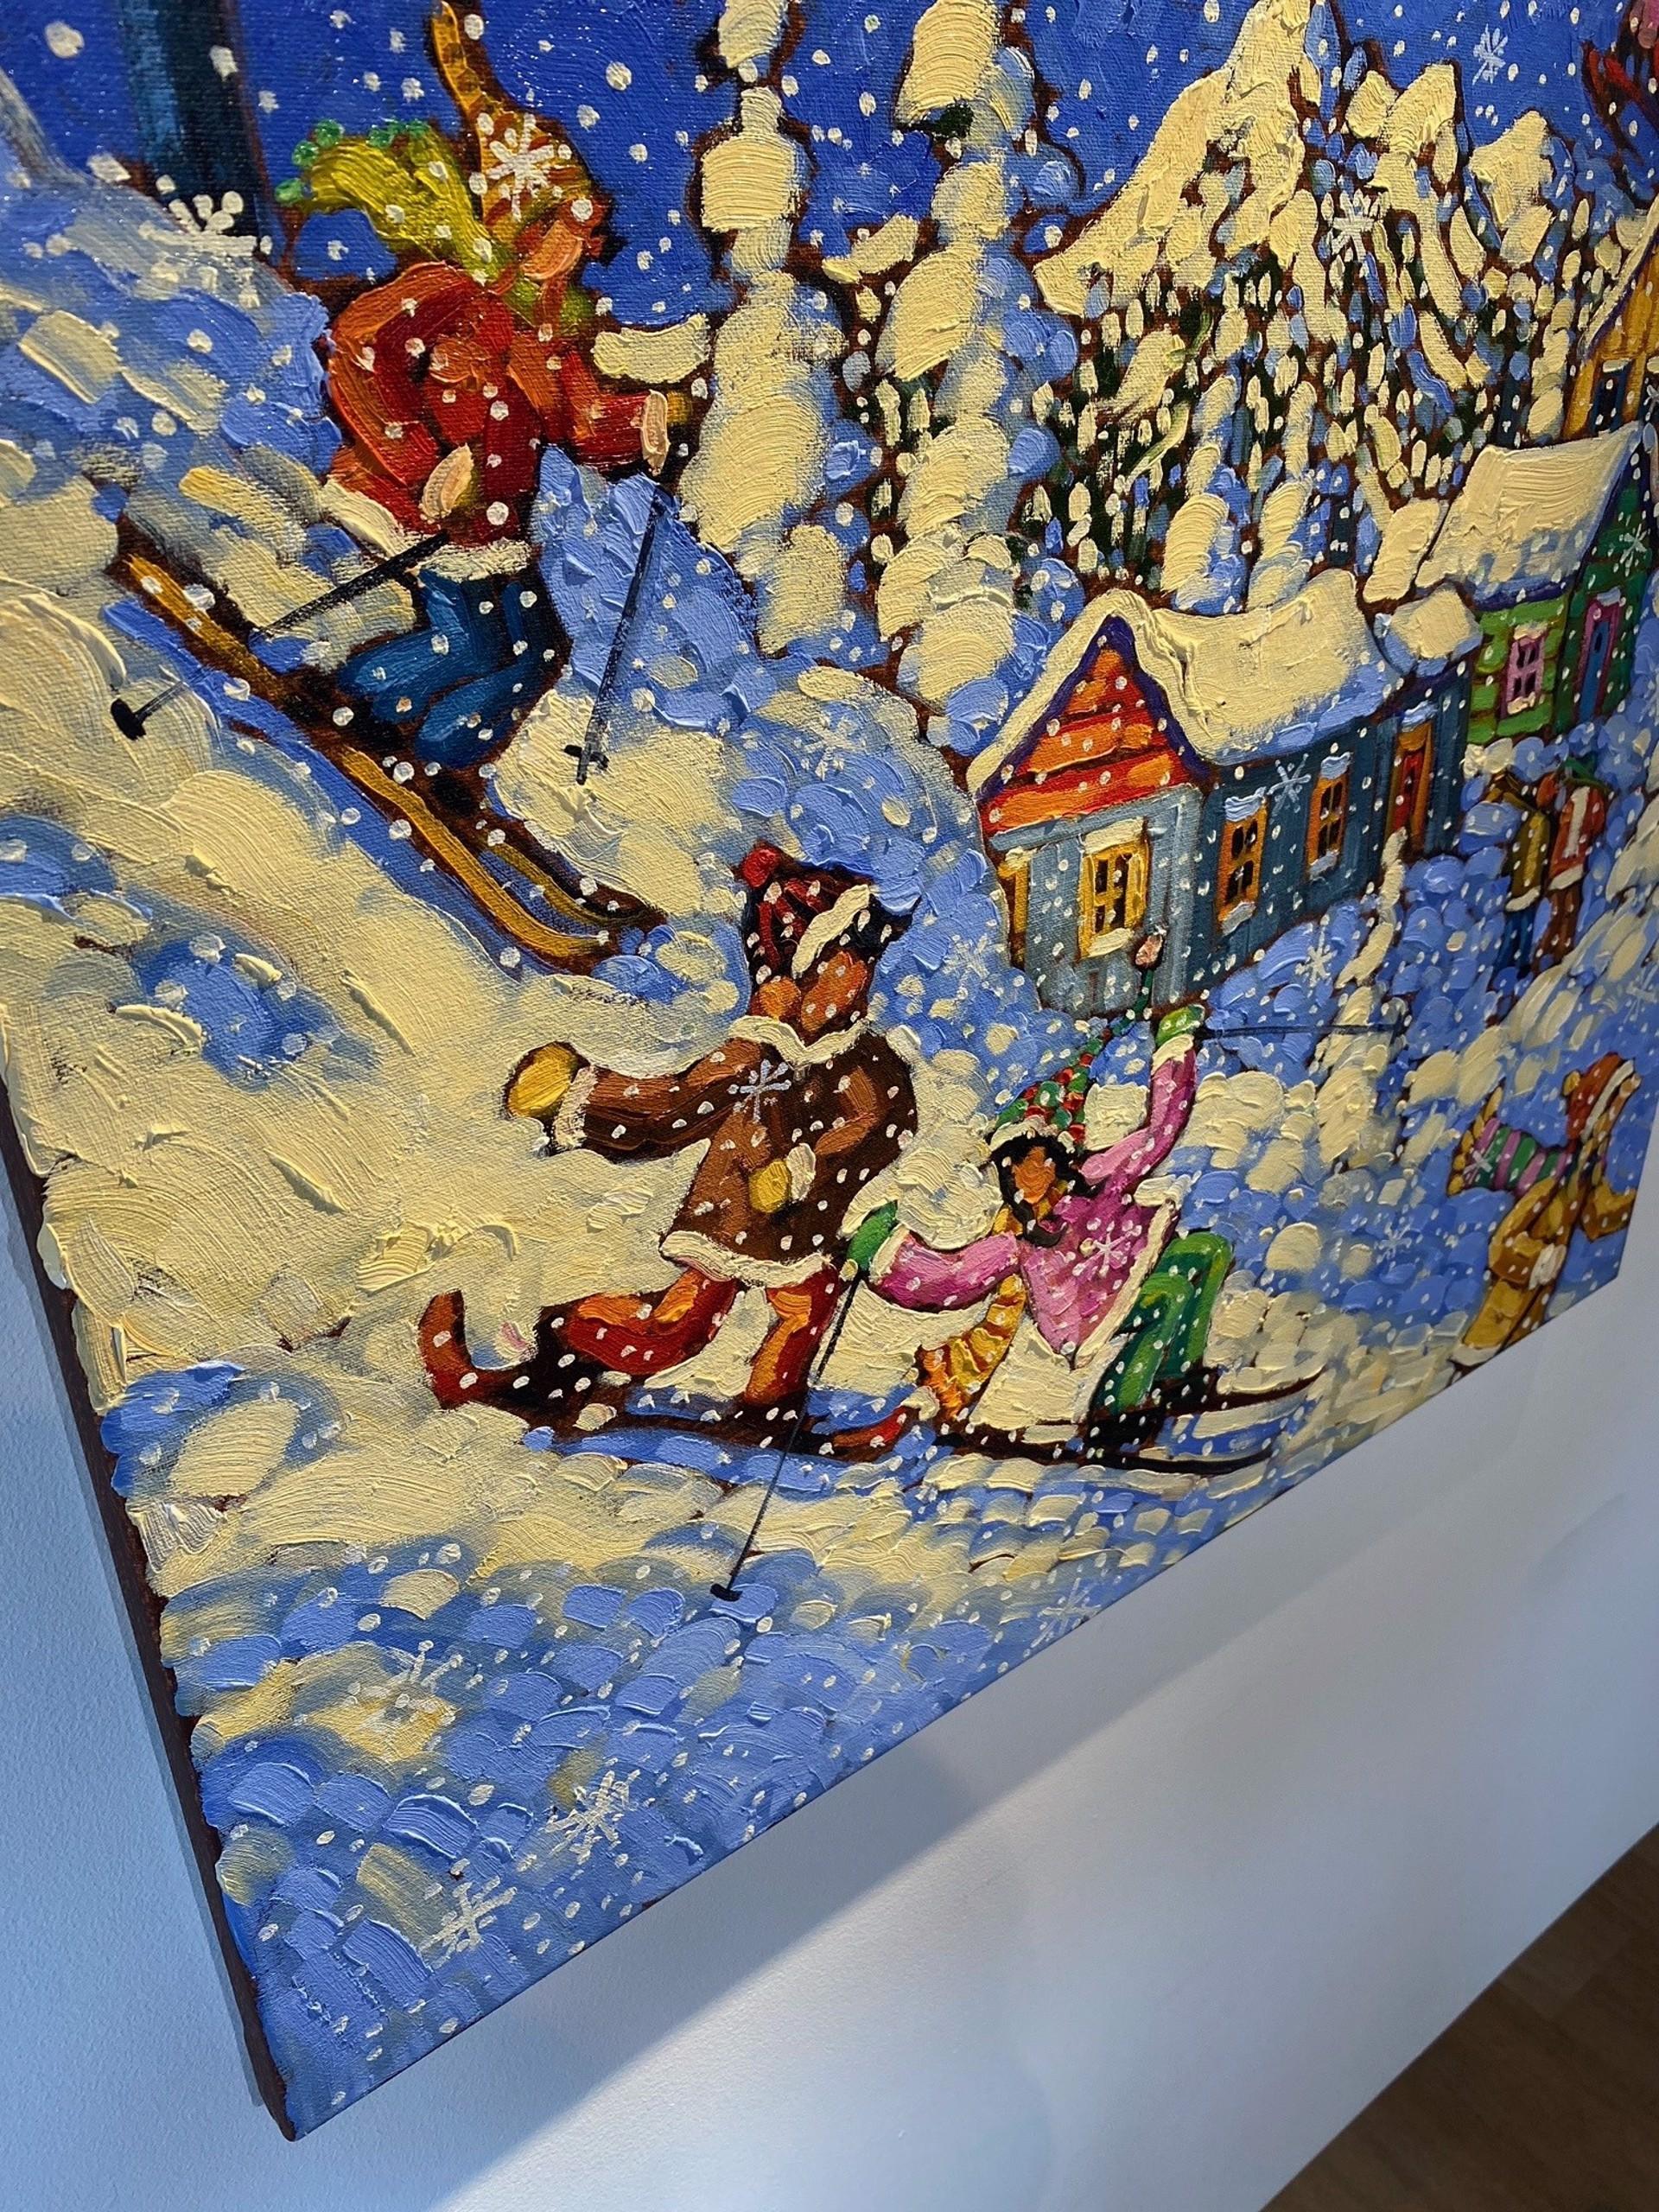 Rod Charlesworth - Snowflake Magic  by Historical Art